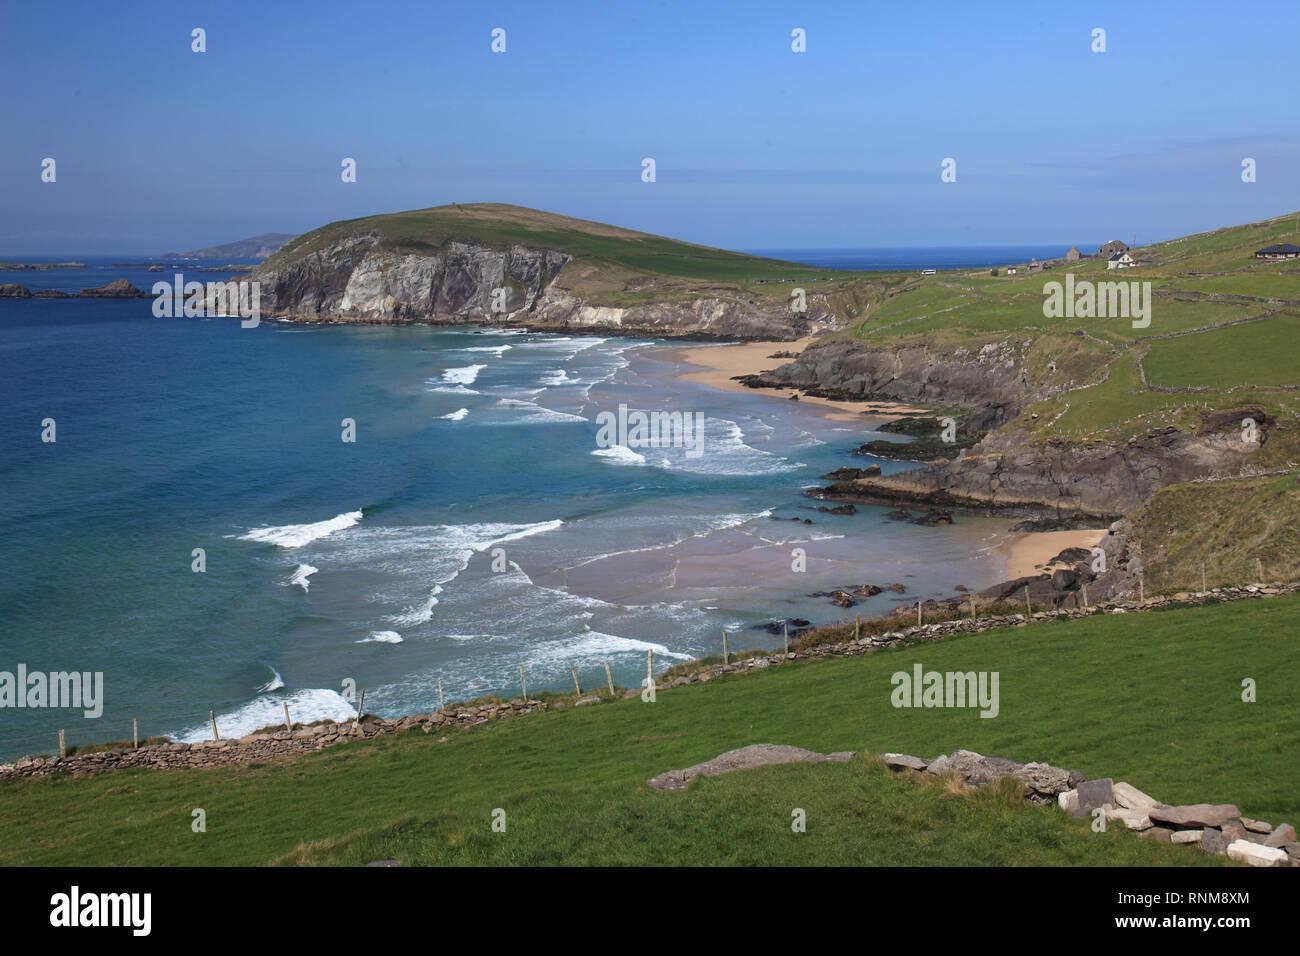 wild atlantic way, dingle peninsula, county kerry, ireland - Stock Image